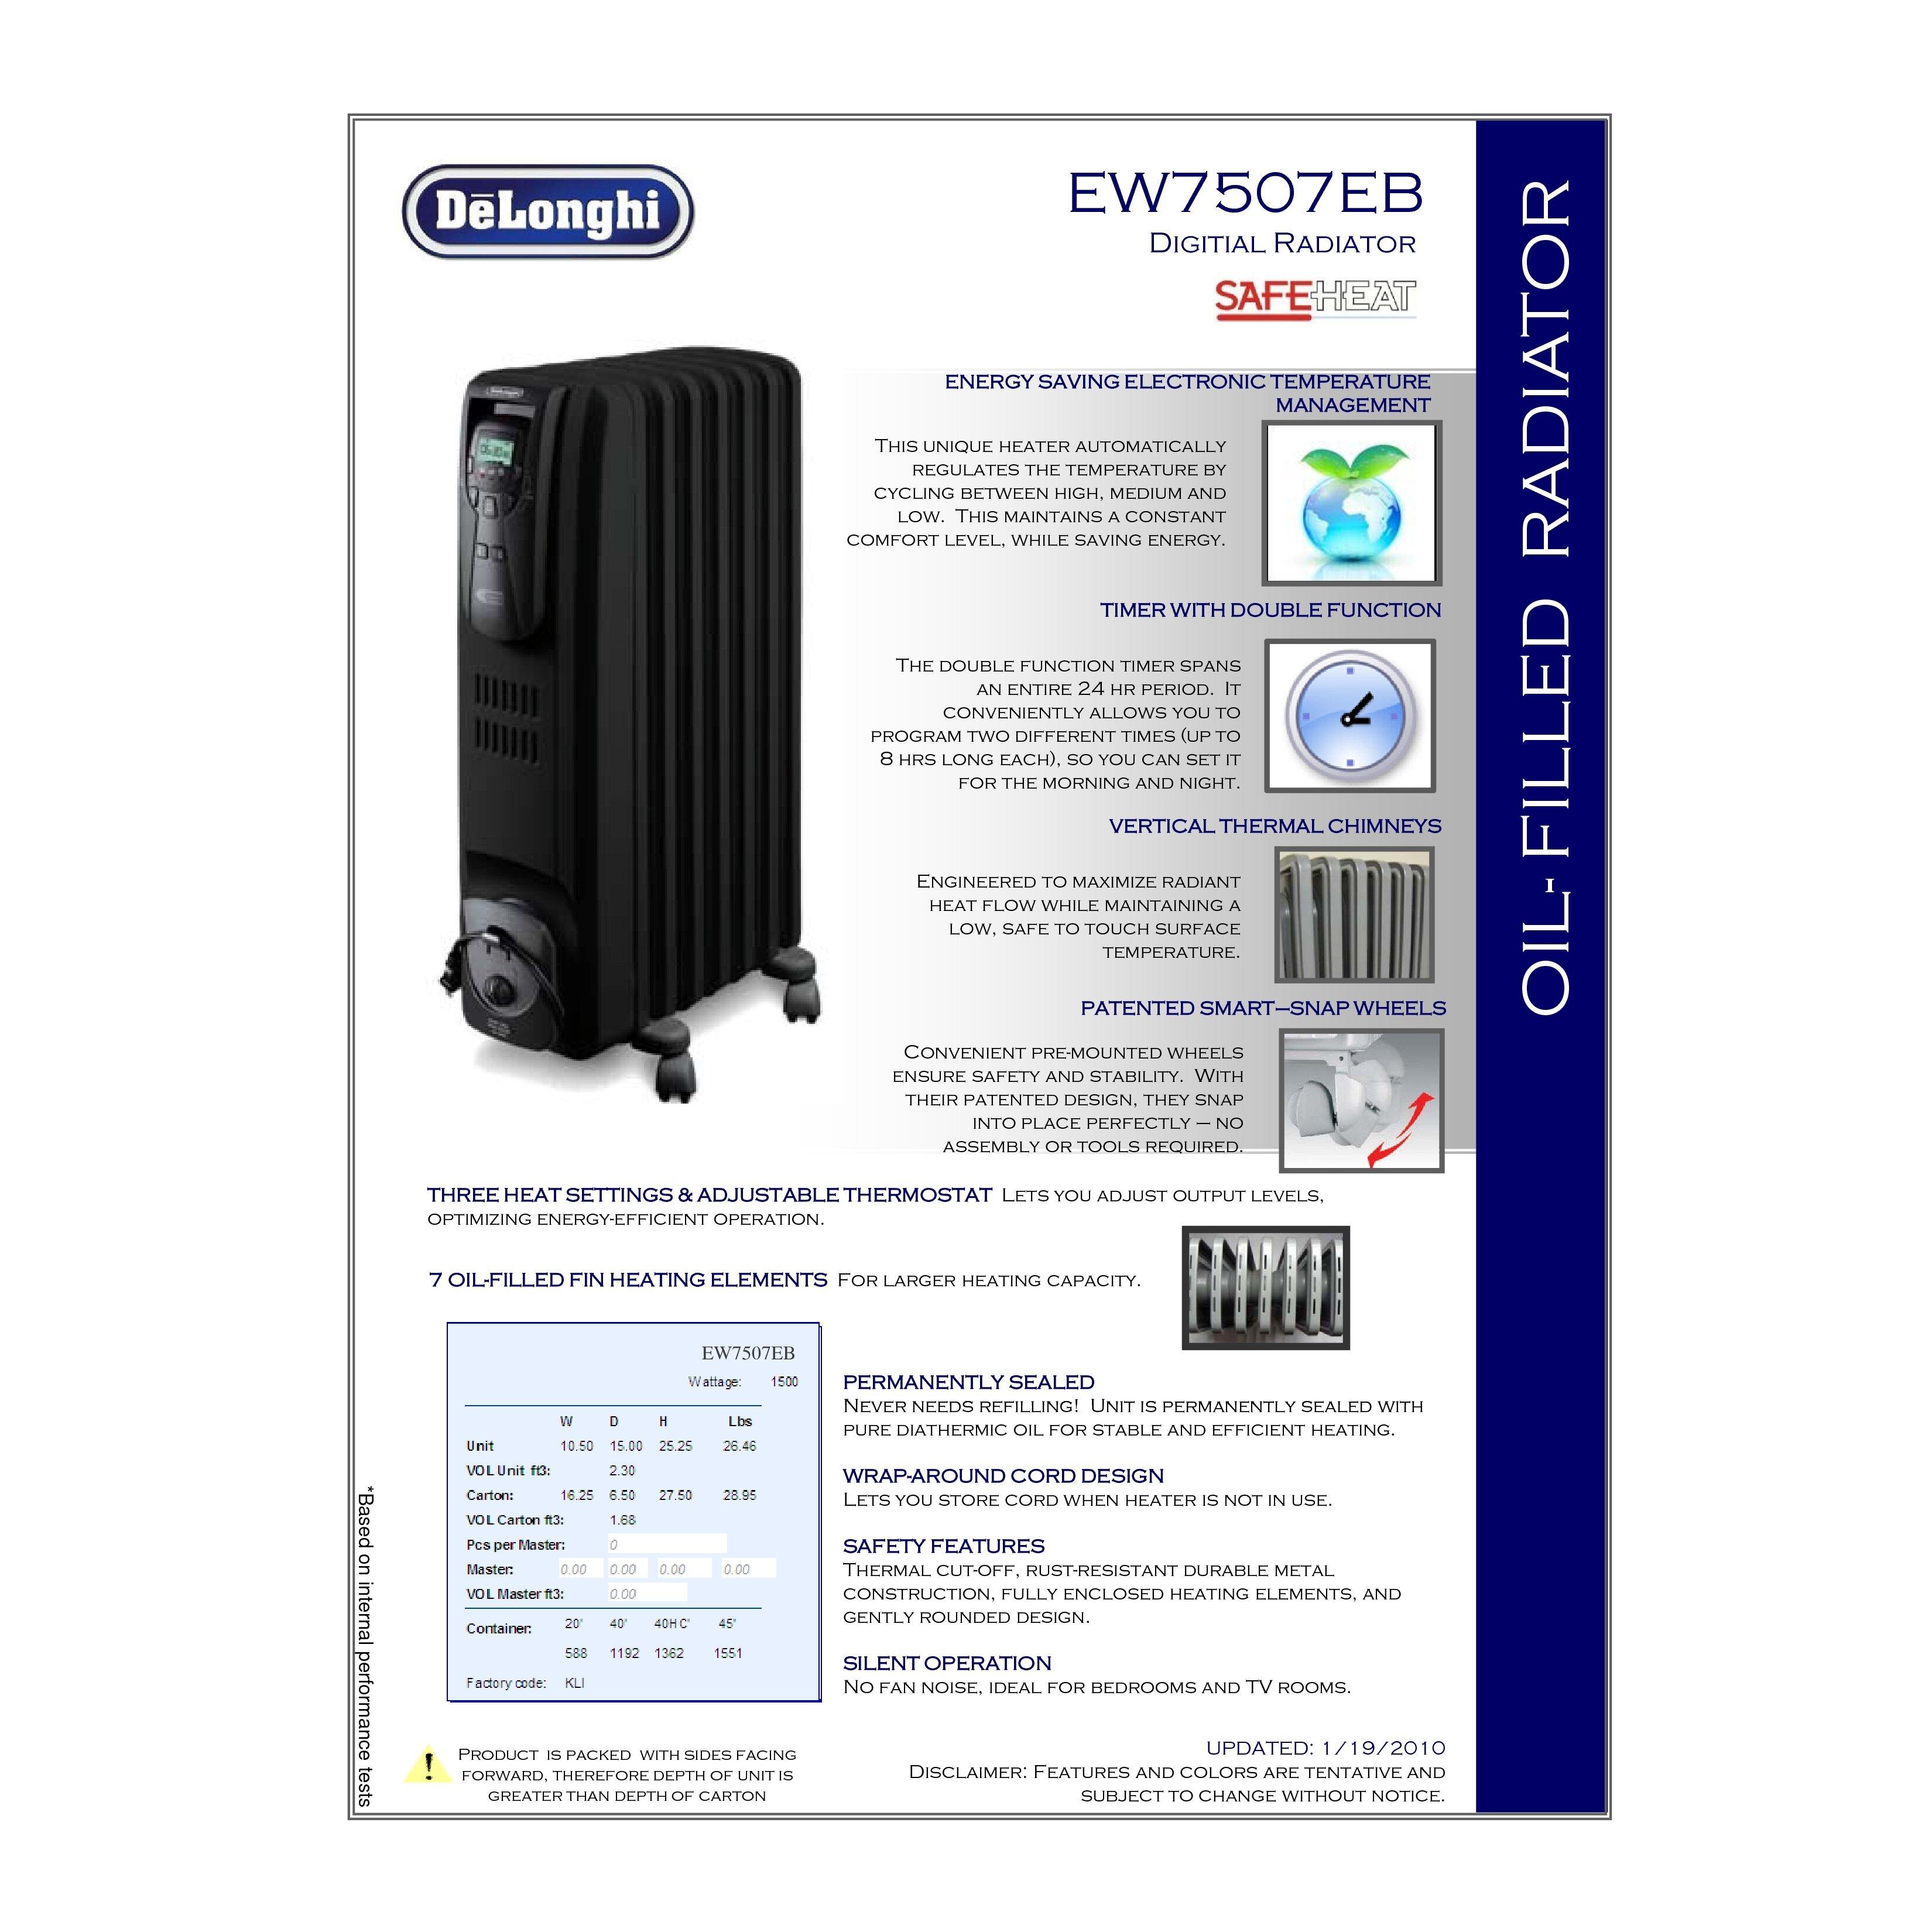 Delonghi safe heat oil filled radiator - Delonghi 1 500 Watt Portable Electric Radiant Radiator Heater